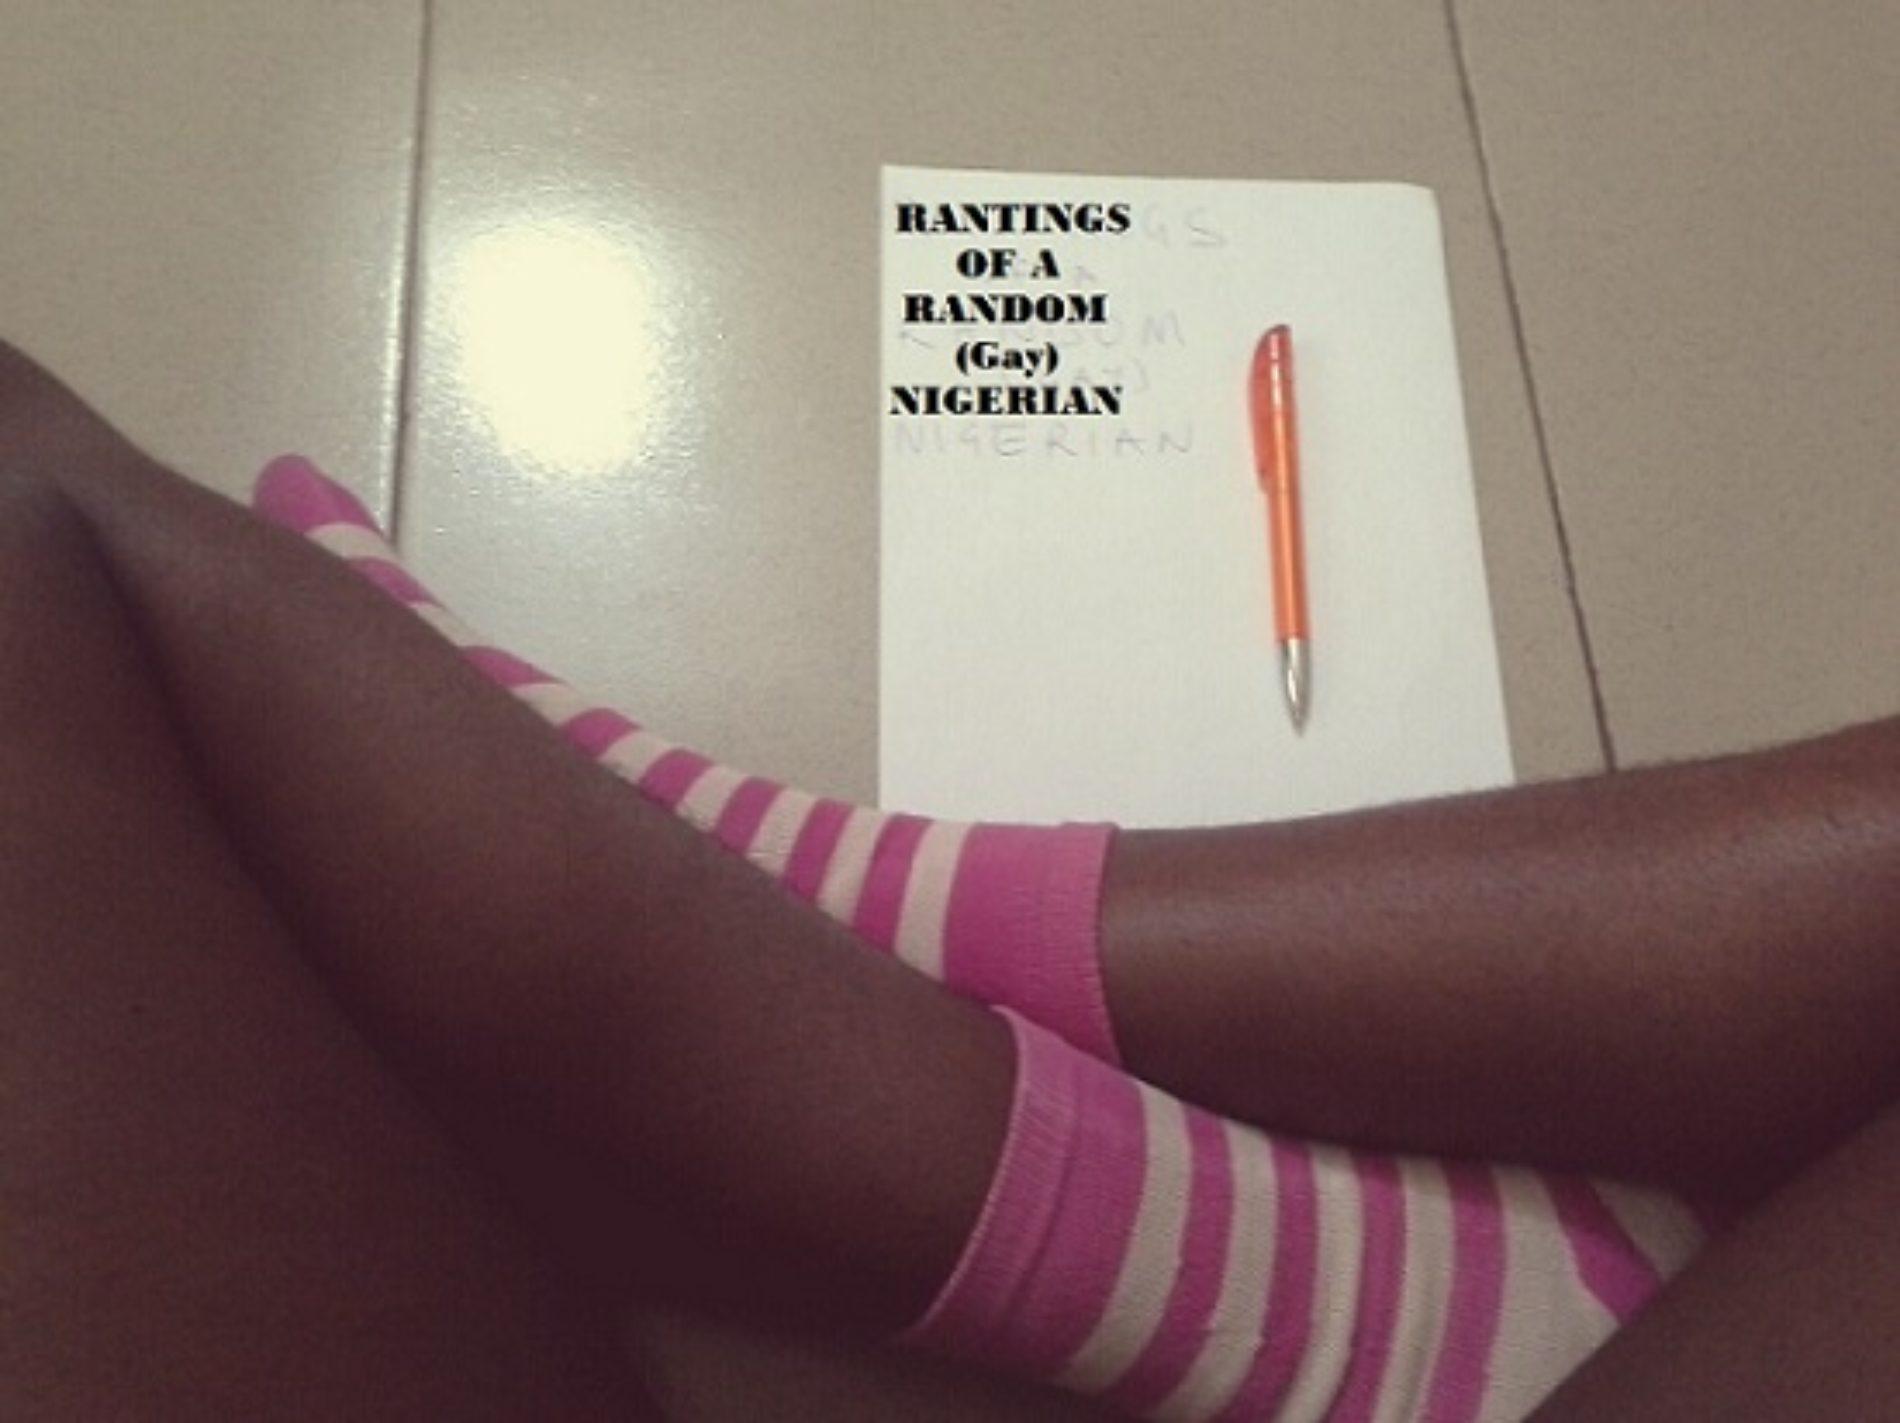 RANTINGS OF A RANDOM (Gay) NIGERIAN (Entry 18)